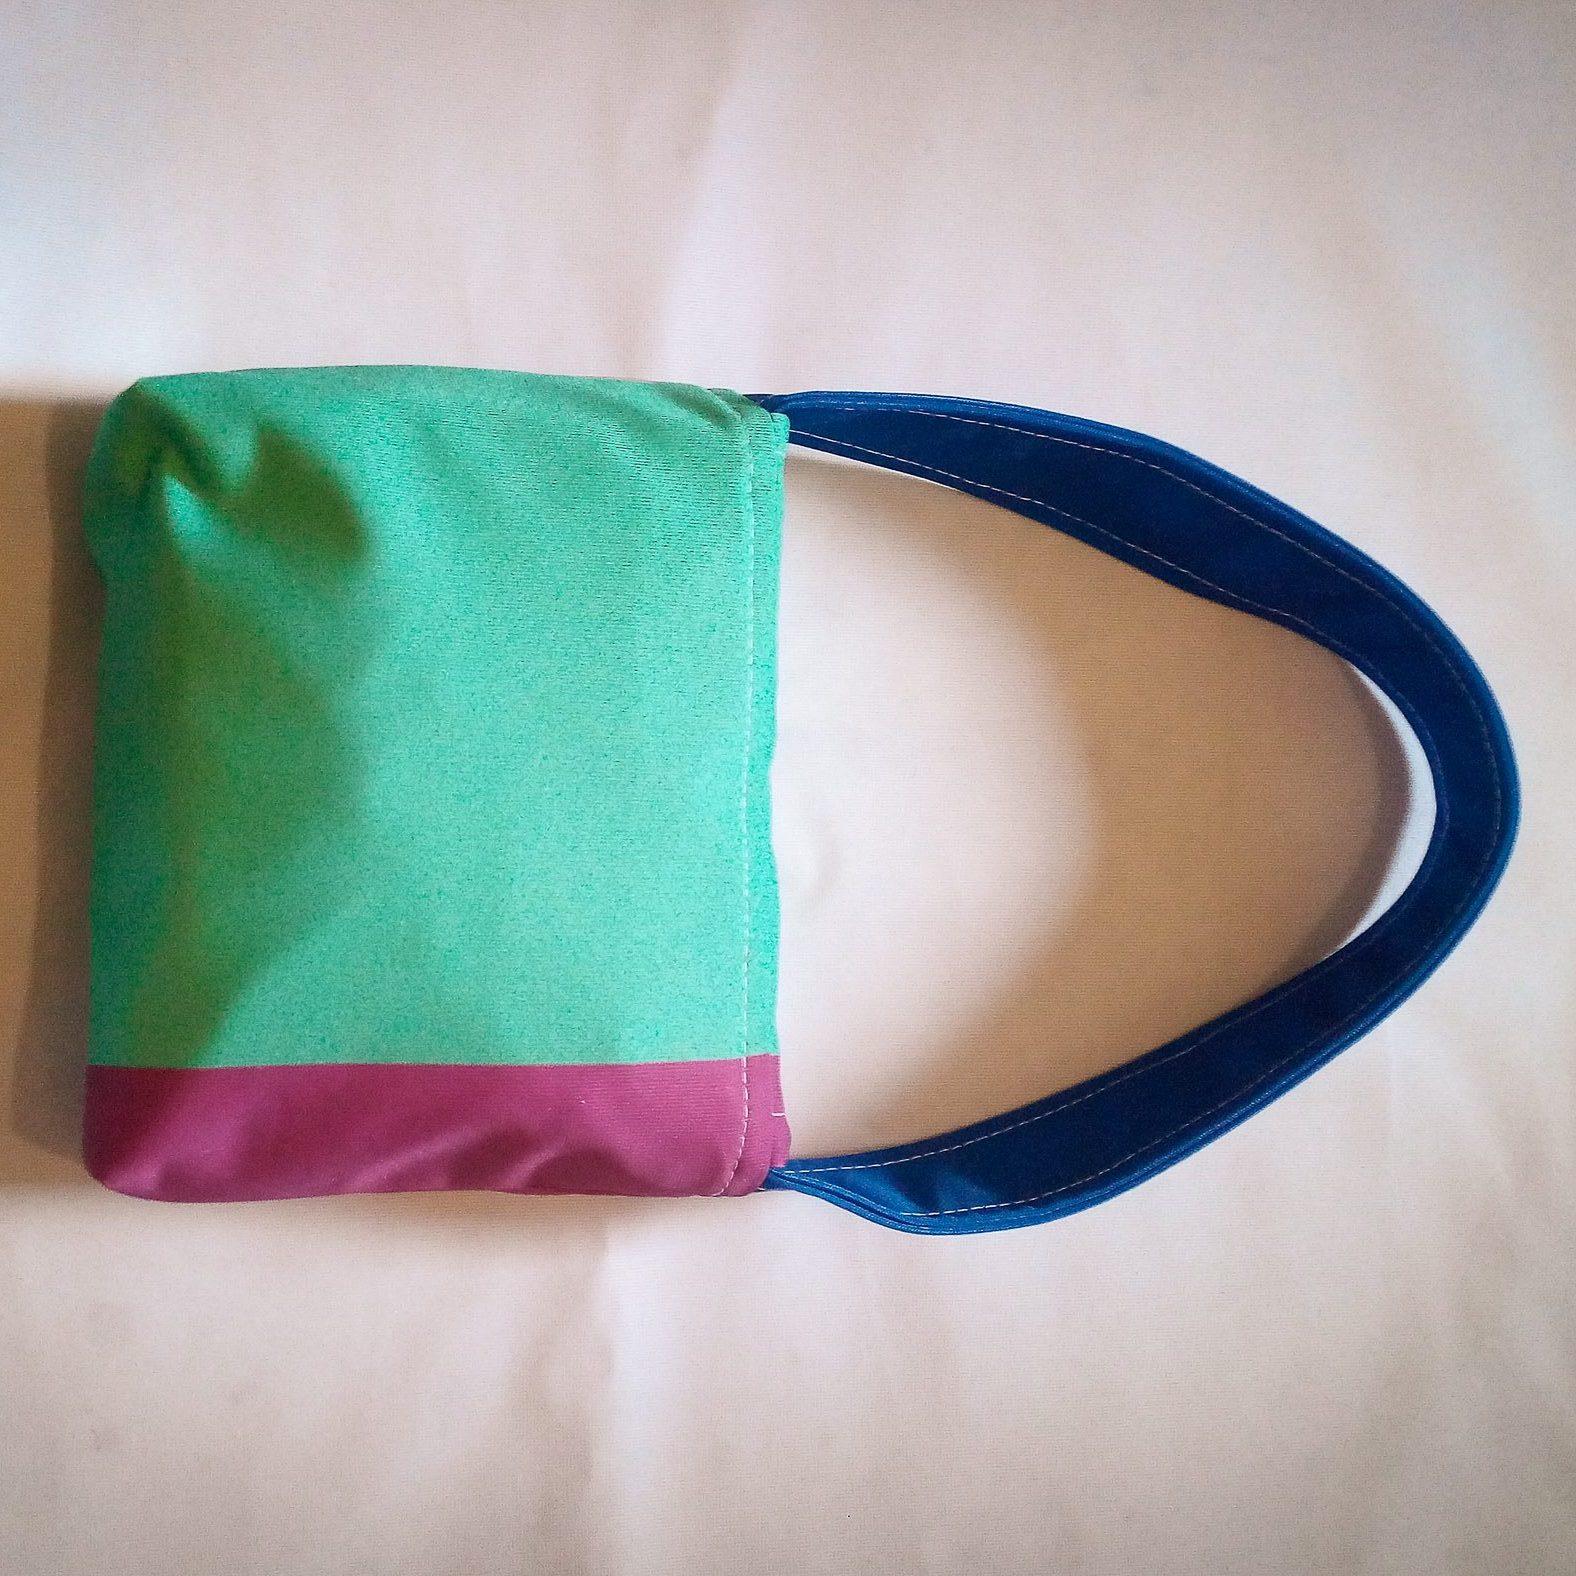 Recycled Eco Friendly Handbag